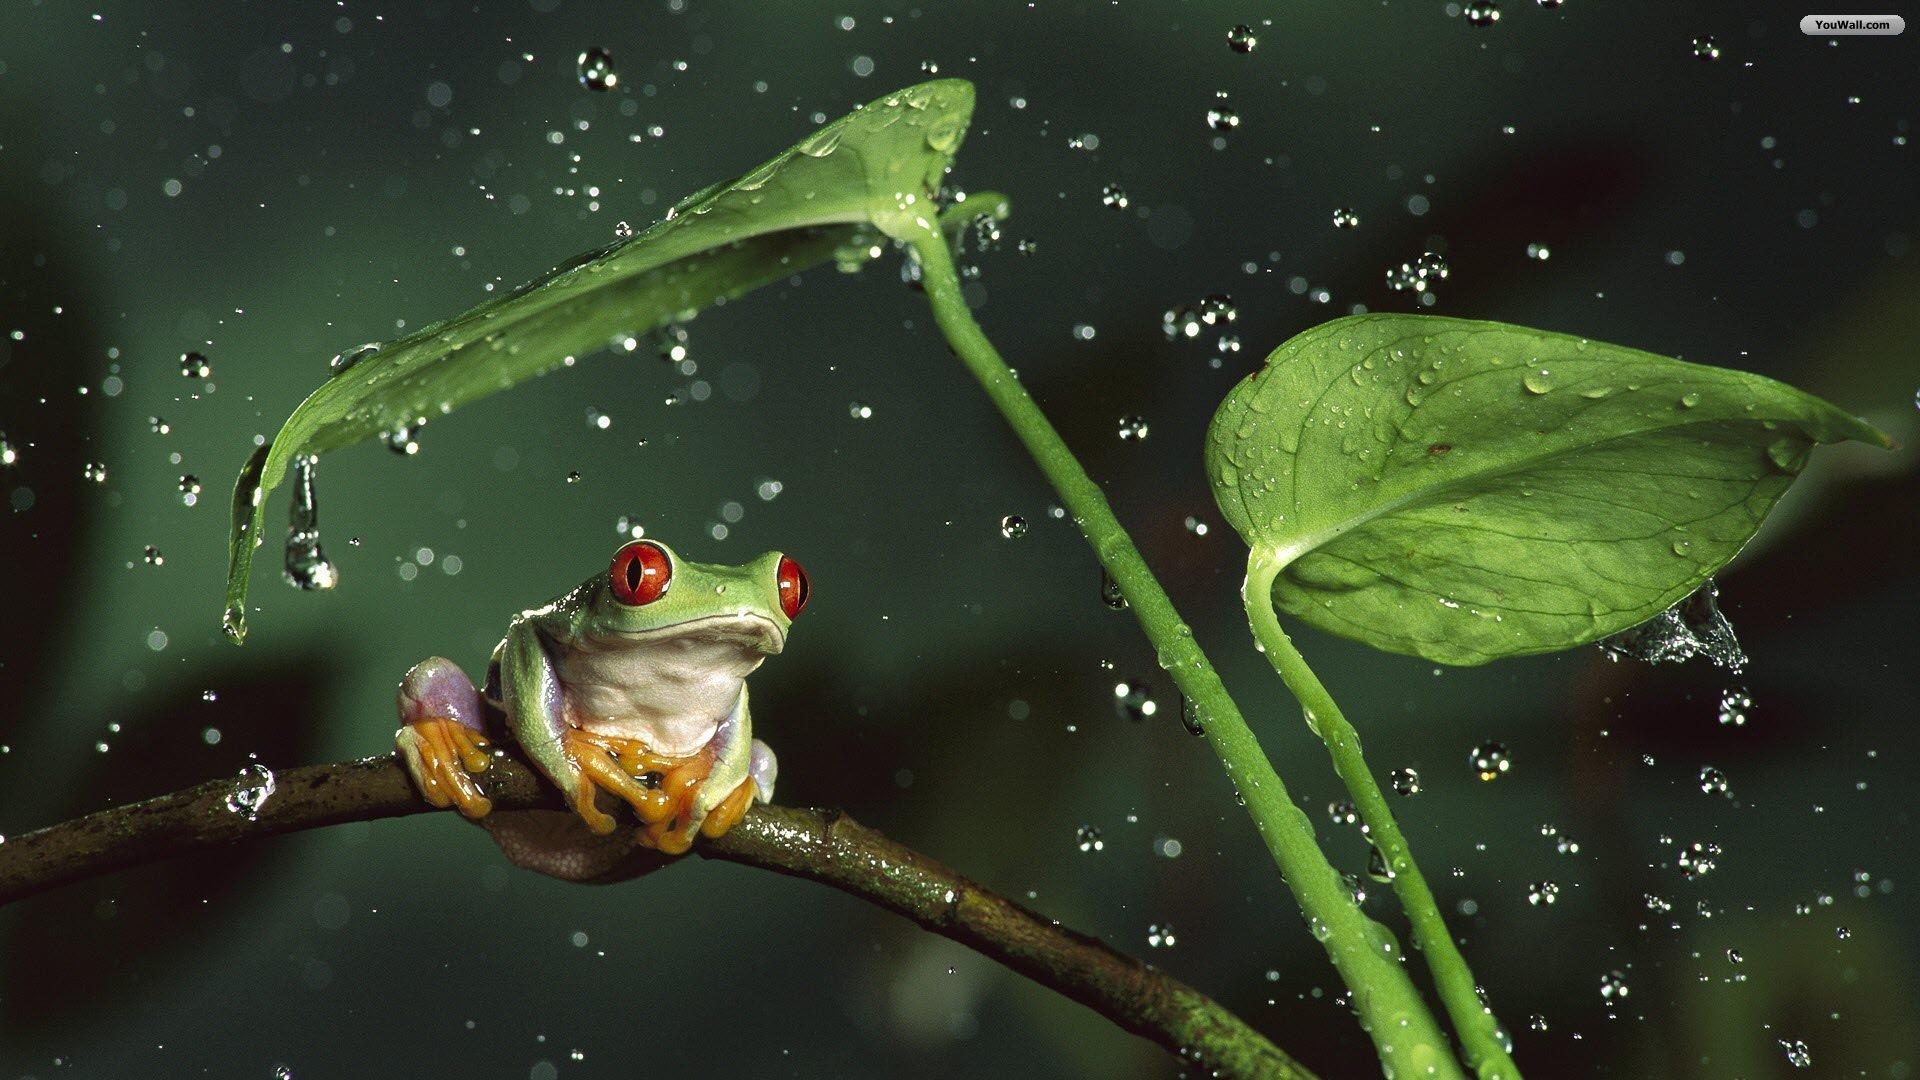 растение лягушка животное природа лист  № 1423104 без смс